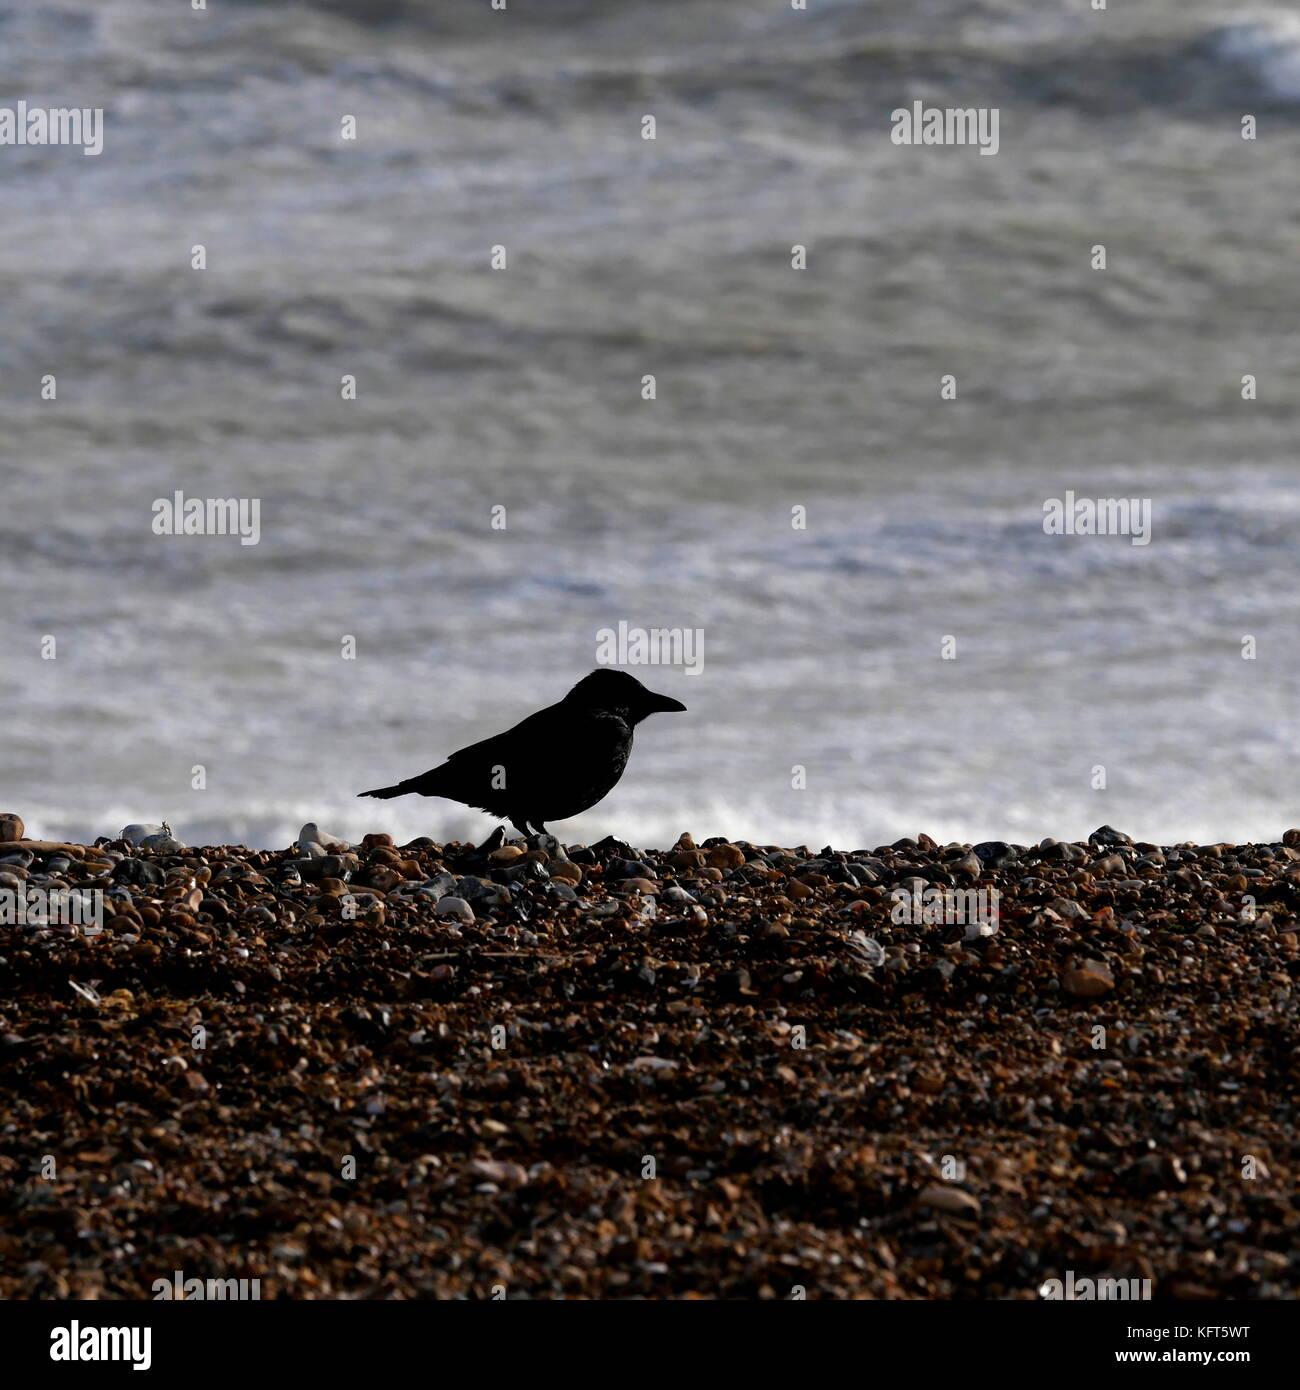 AJAXNETPHOTO. Oktober, 2017. WORTHING, England. - Strand Vogel. - Eine schwarze Krähe BRAVES starke Winde AM STRAND Stockfoto